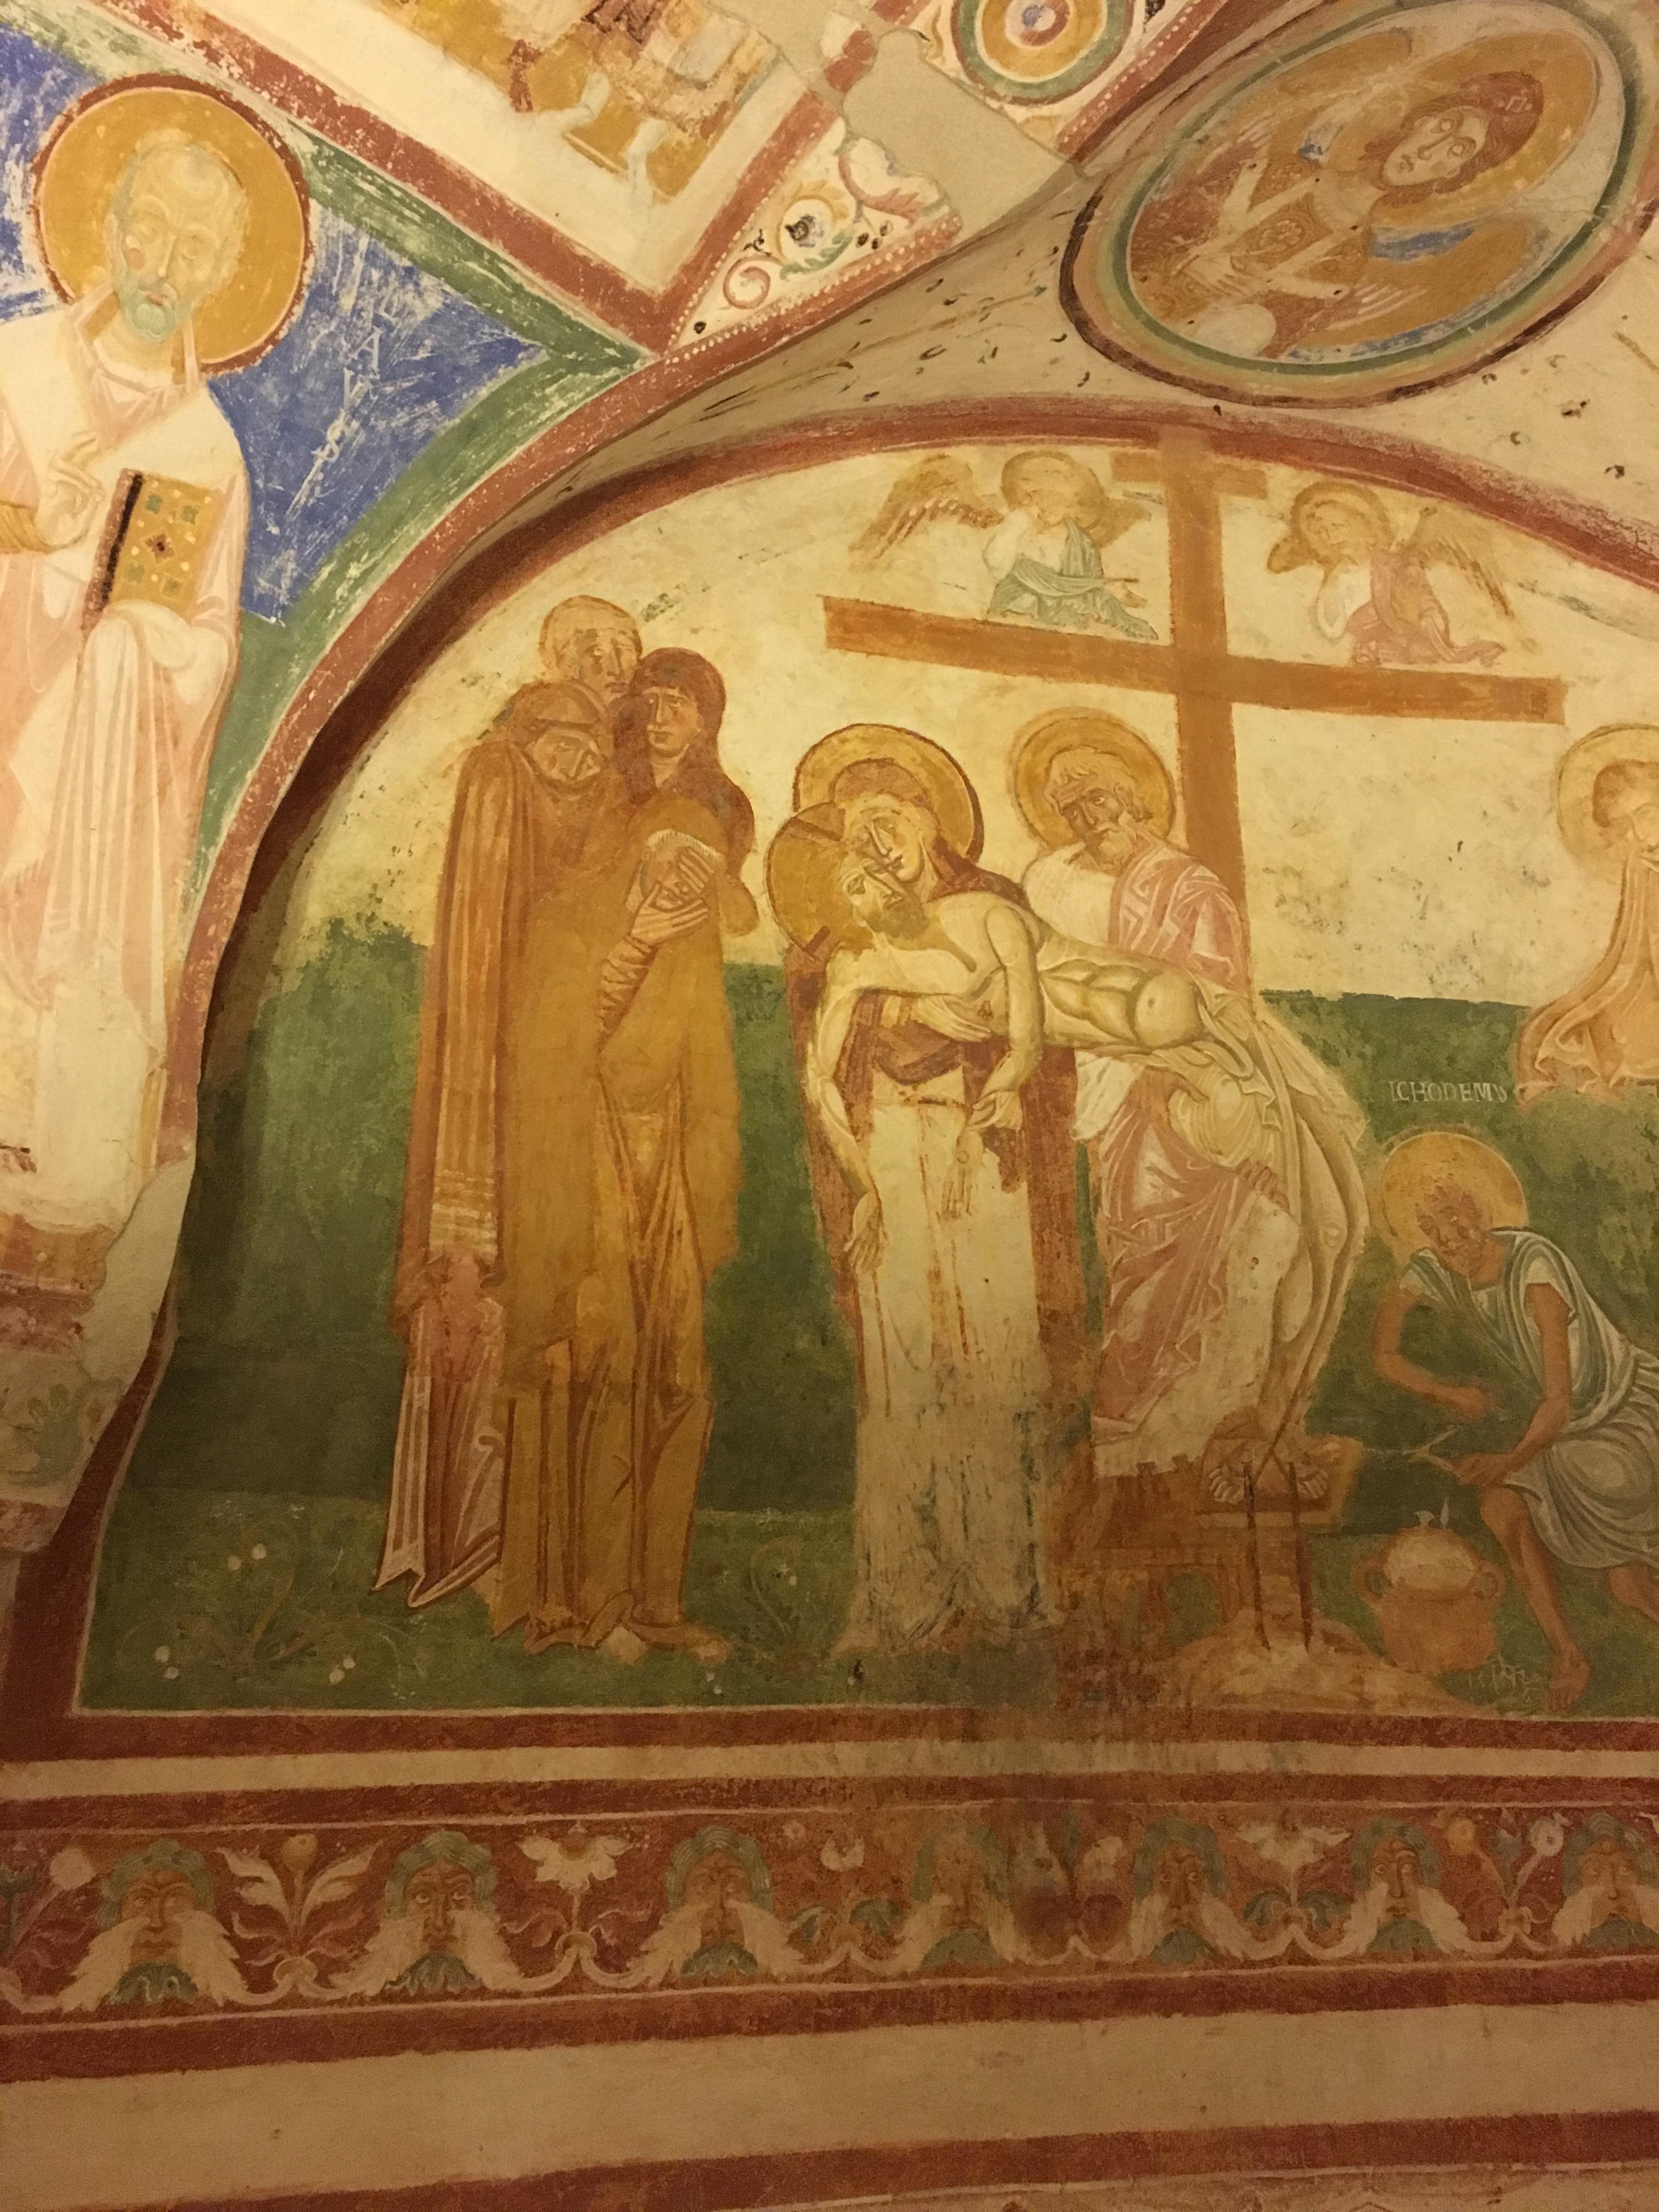 Aquileia Humanistic Frescoes - Crypt 13th Century